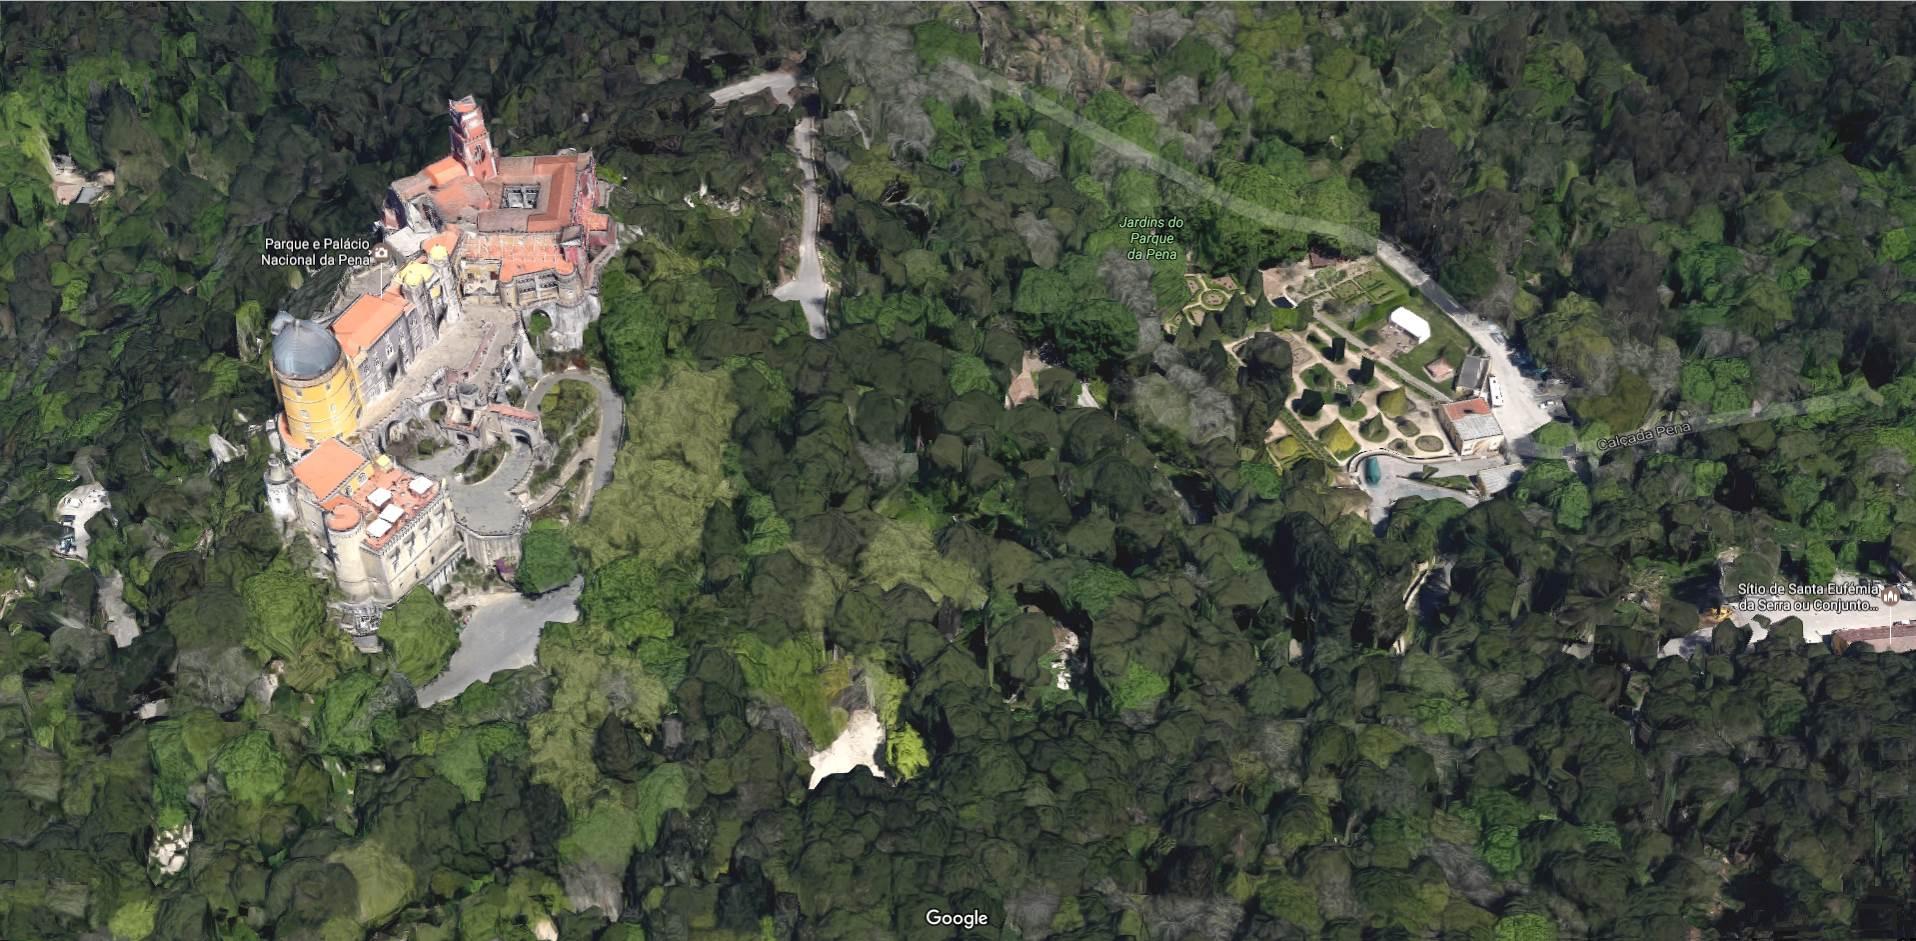 Pena Palace Sintra Portugal # Muebles Moedano